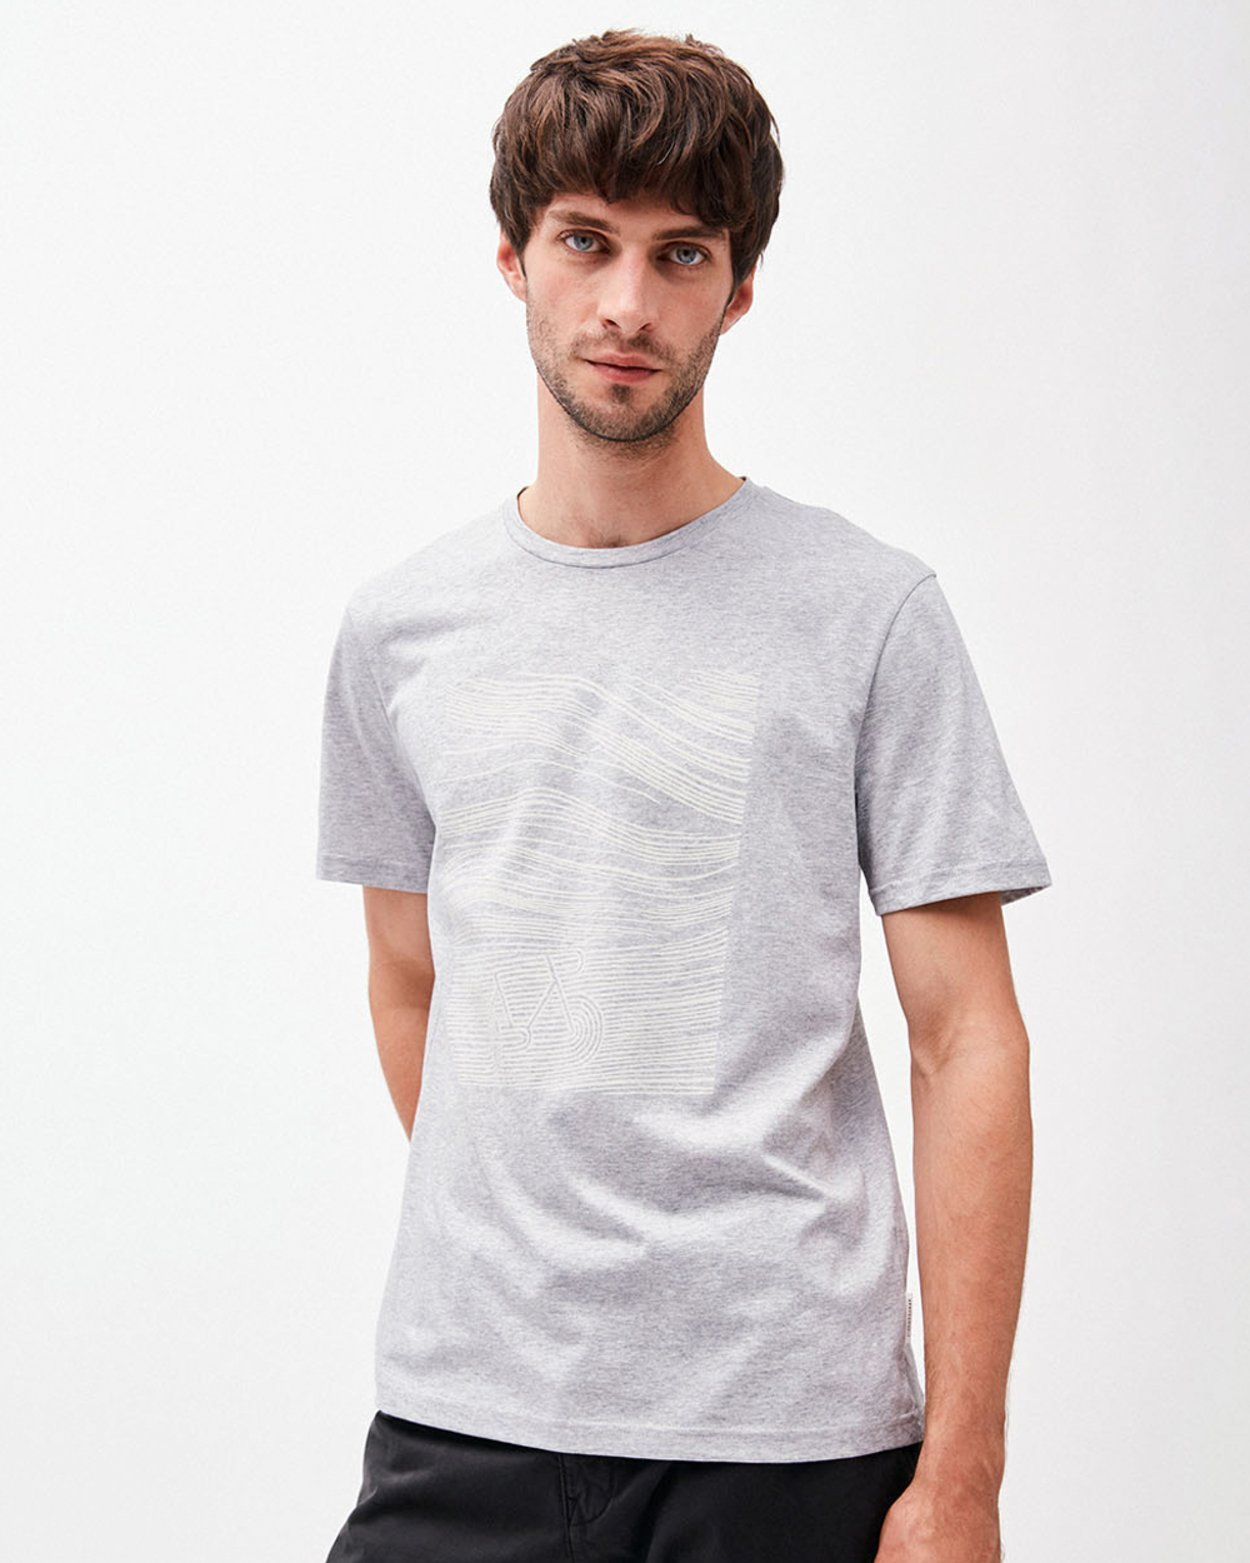 Jaames Bicycle Tee-Shirt